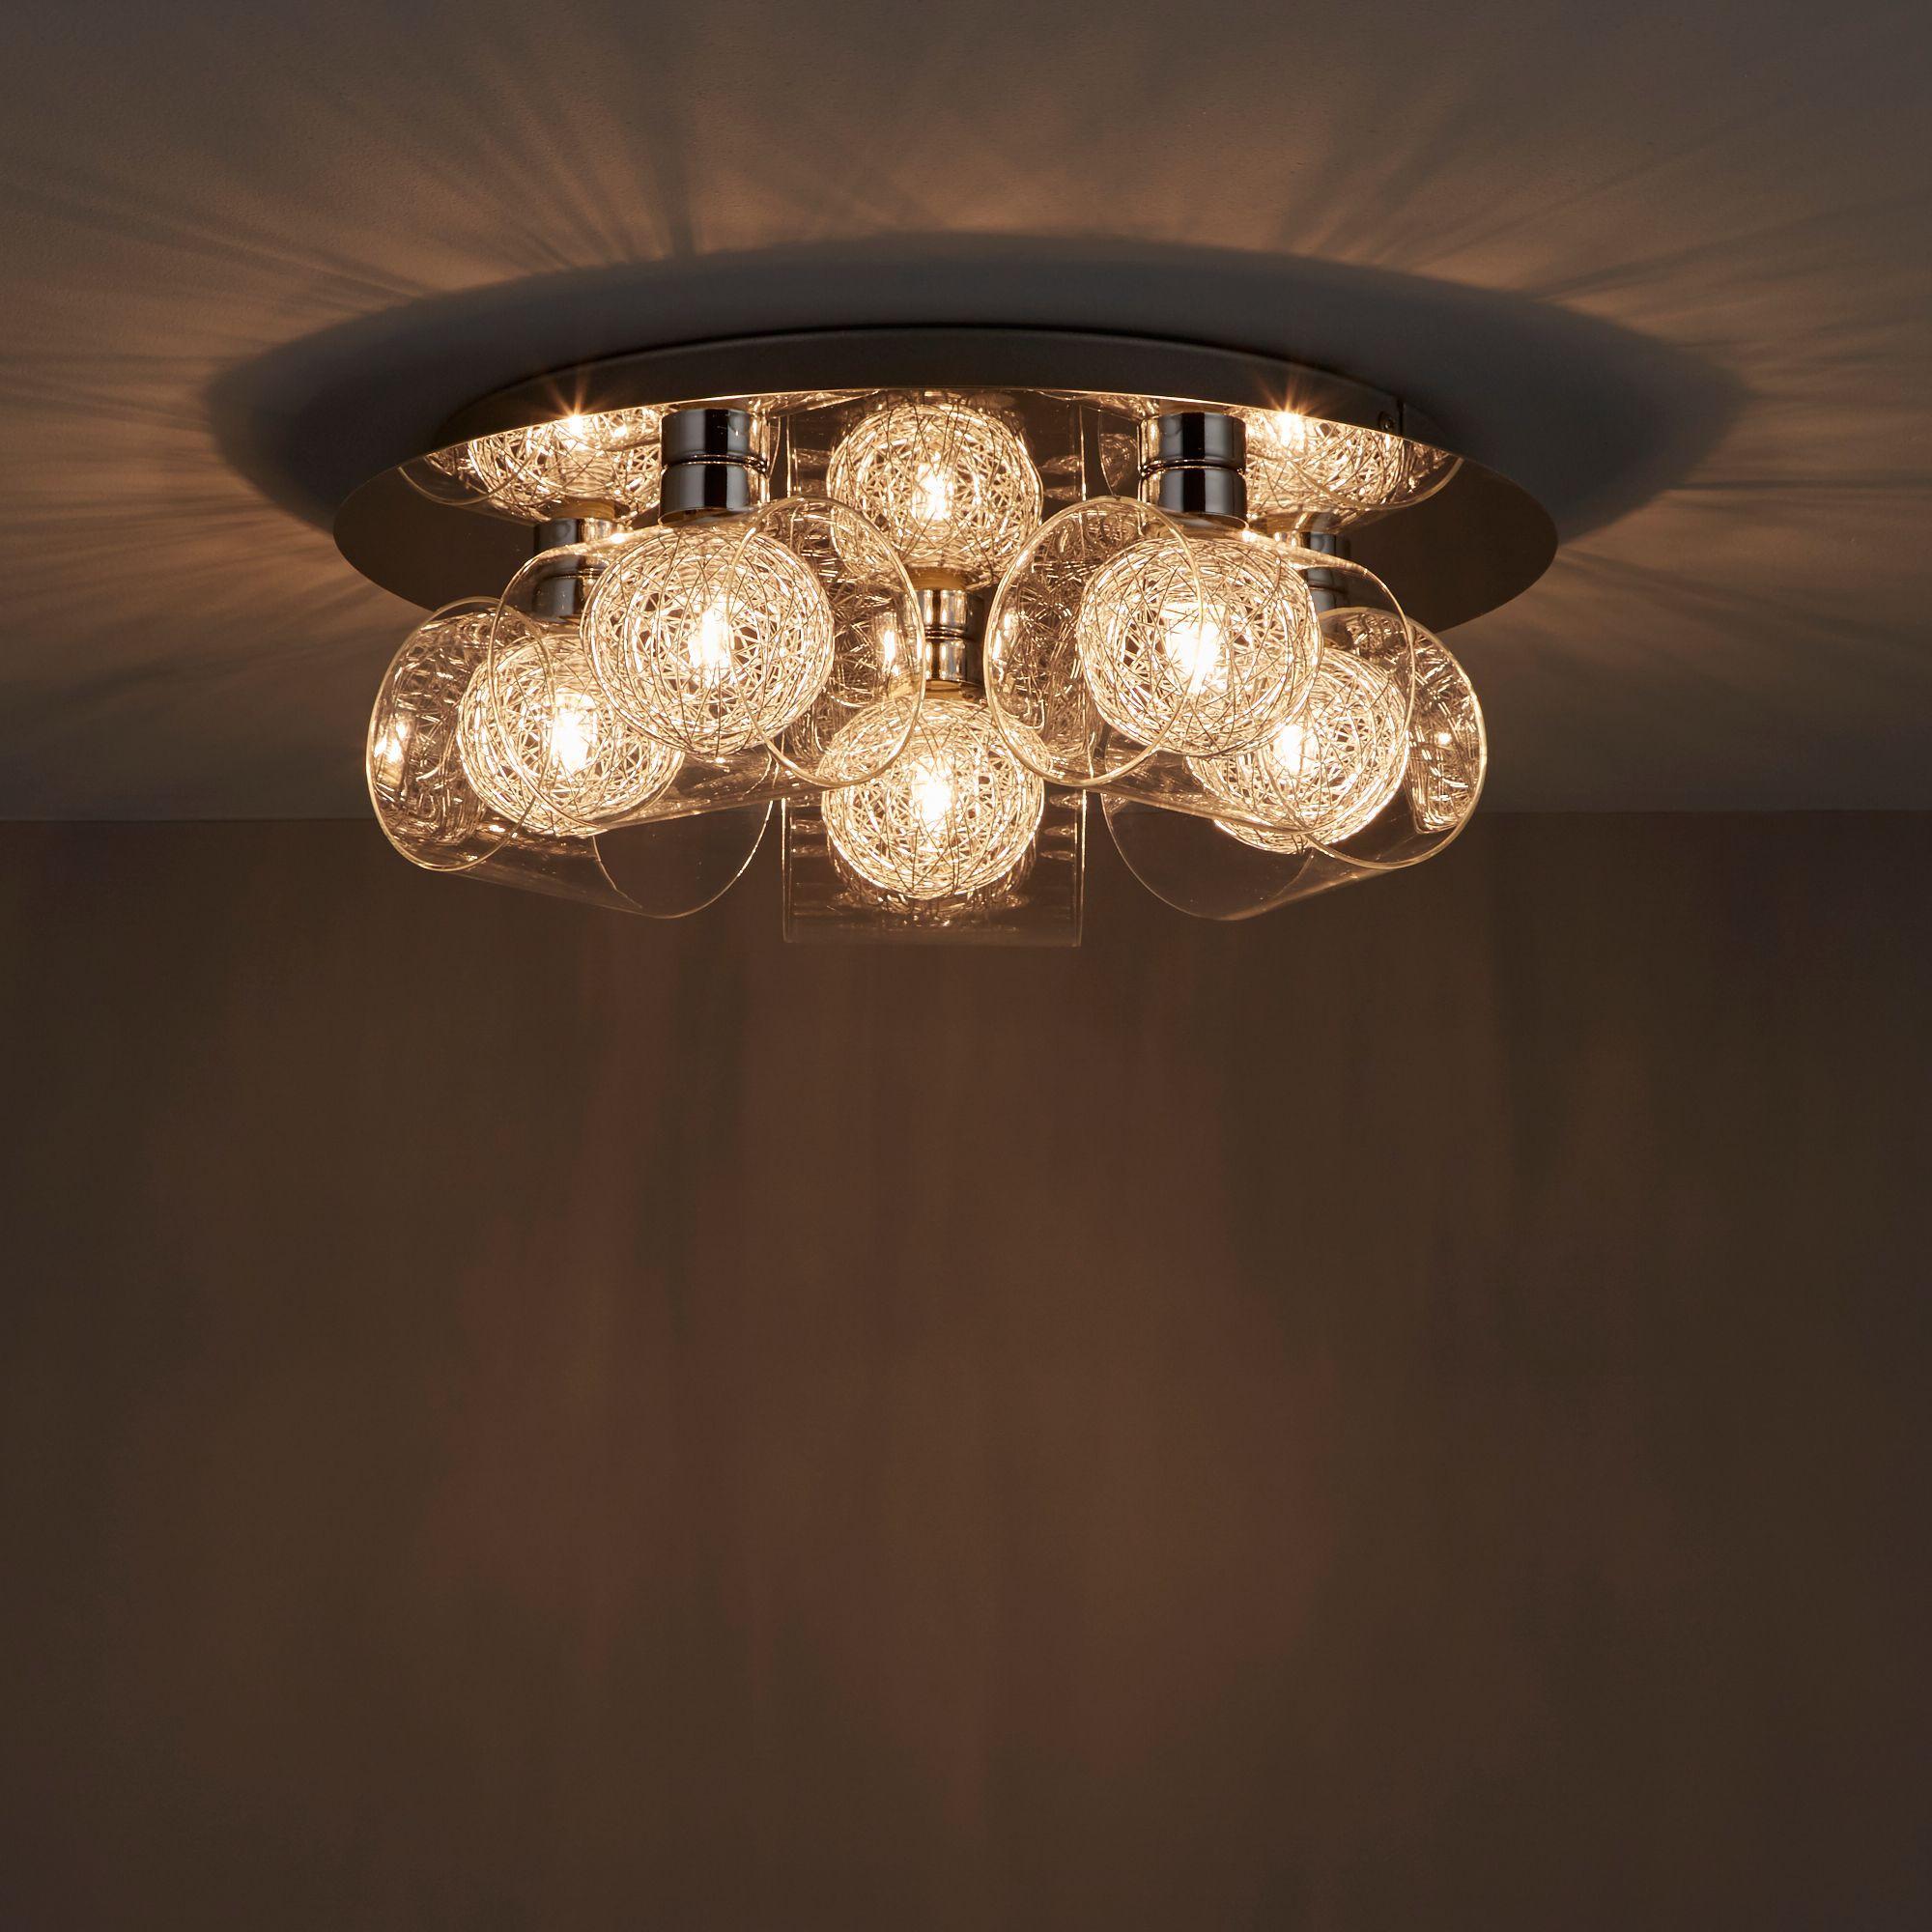 camenae chrome effect  lamp ceiling light departments diy  bq